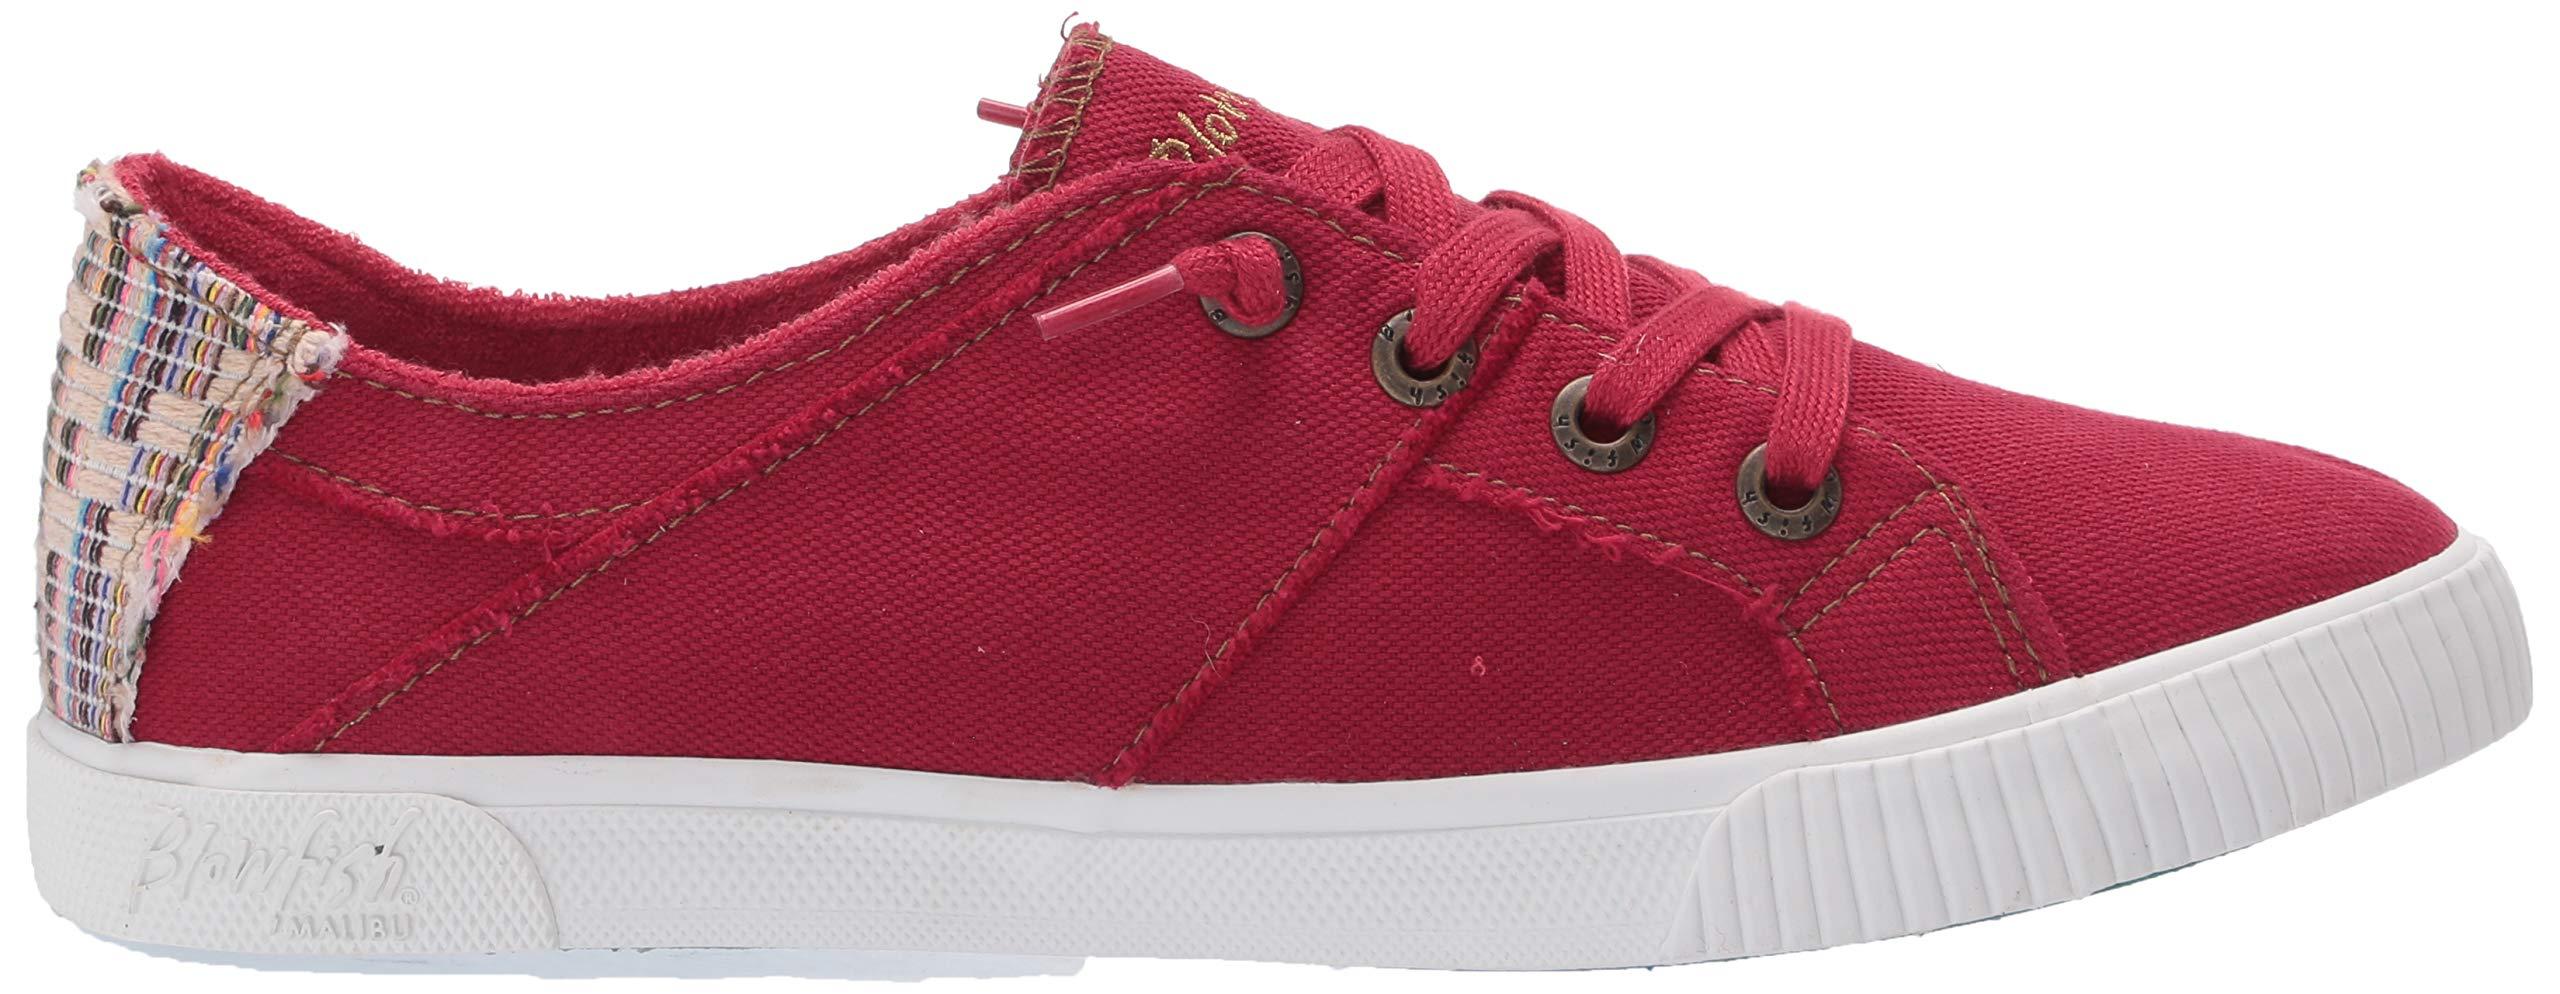 Blowfish Malibu Womens Fruit Fashion Sneaker Dusty Blue 8 Medium US